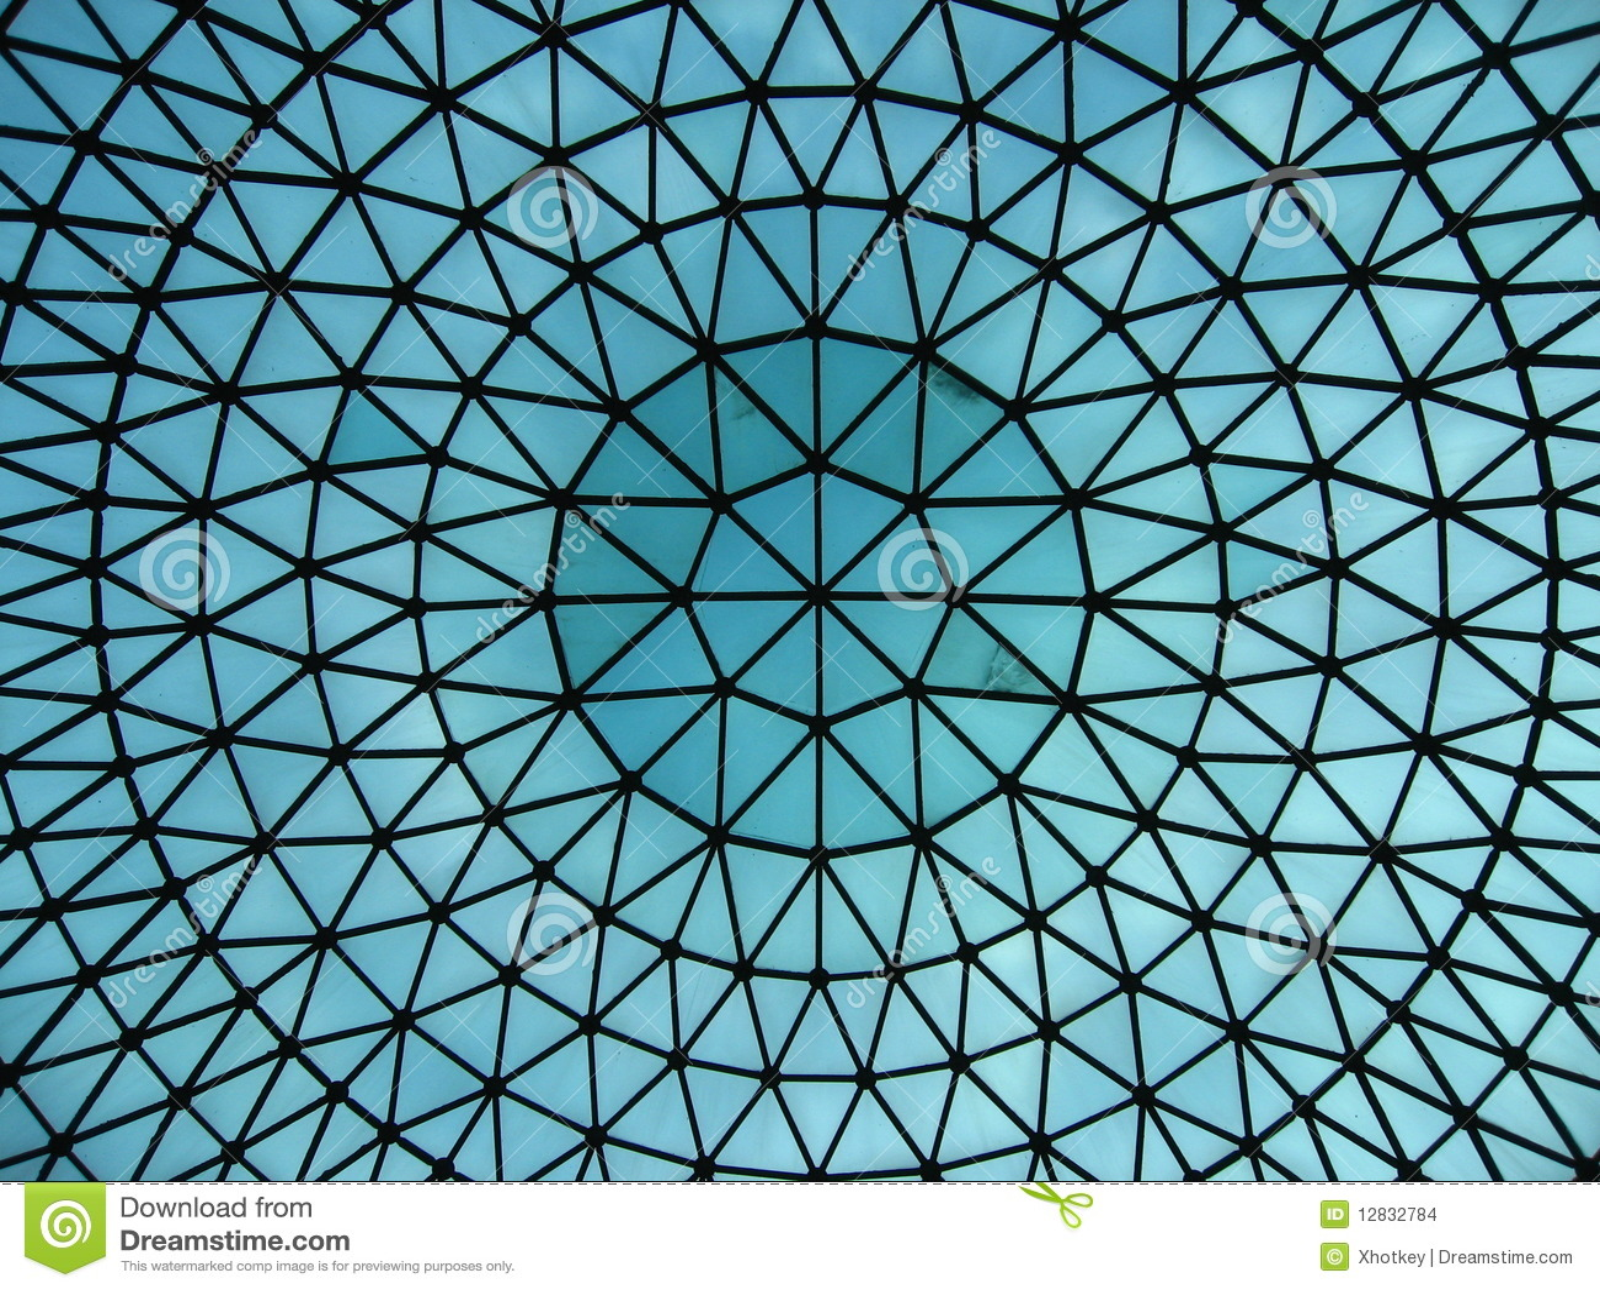 Glass Dome Of Railway Station Hall Stock Photo Image Of